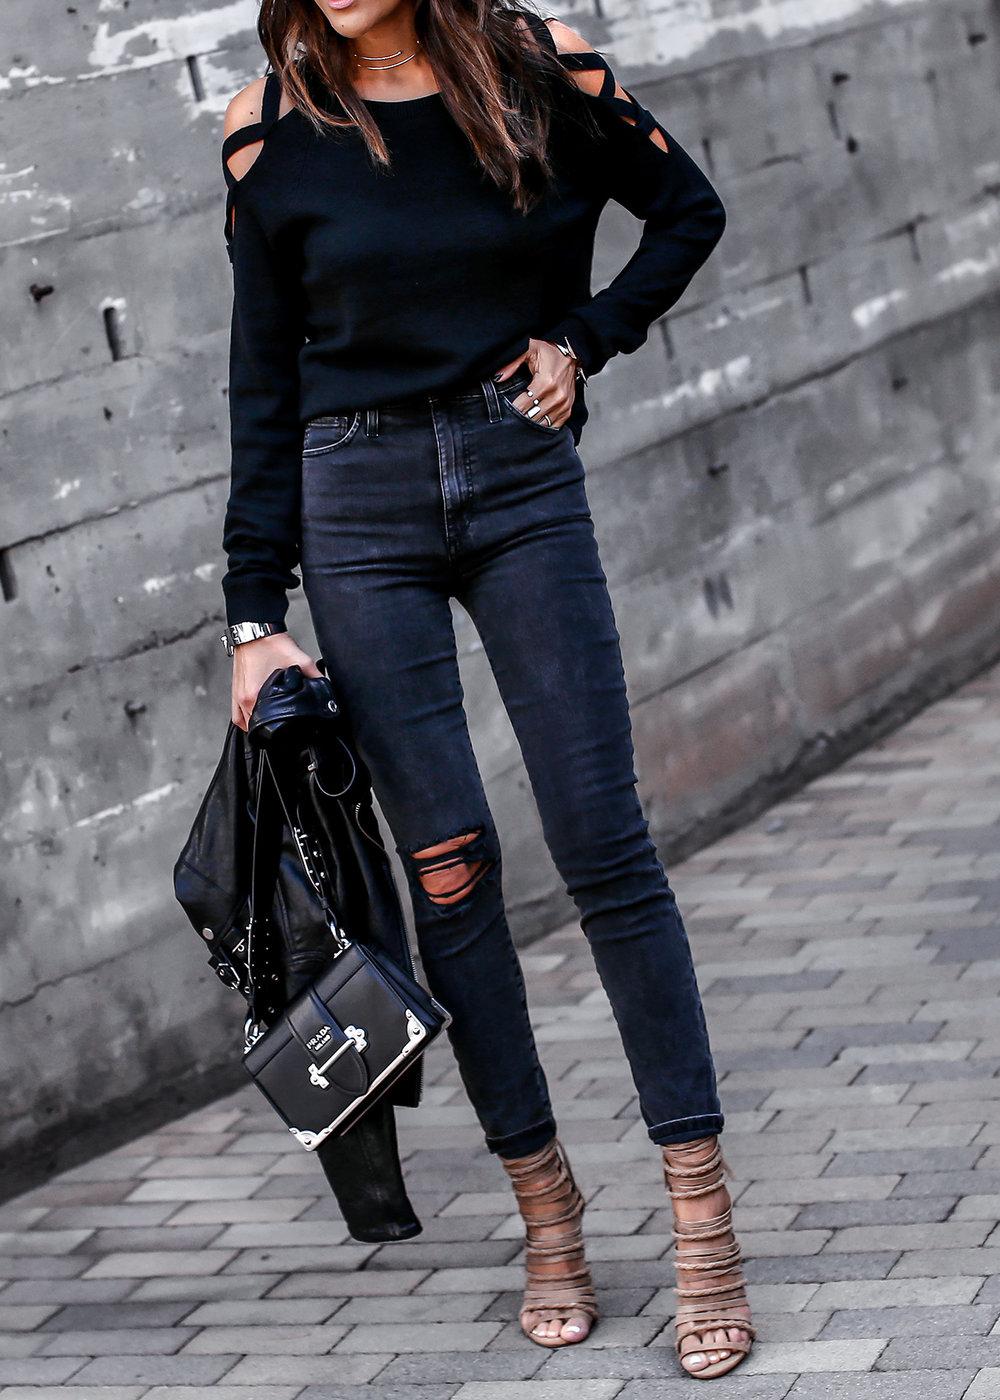 Joes Jeans Acid Wash Denim Cutout Sweater Streetstyle.jpg